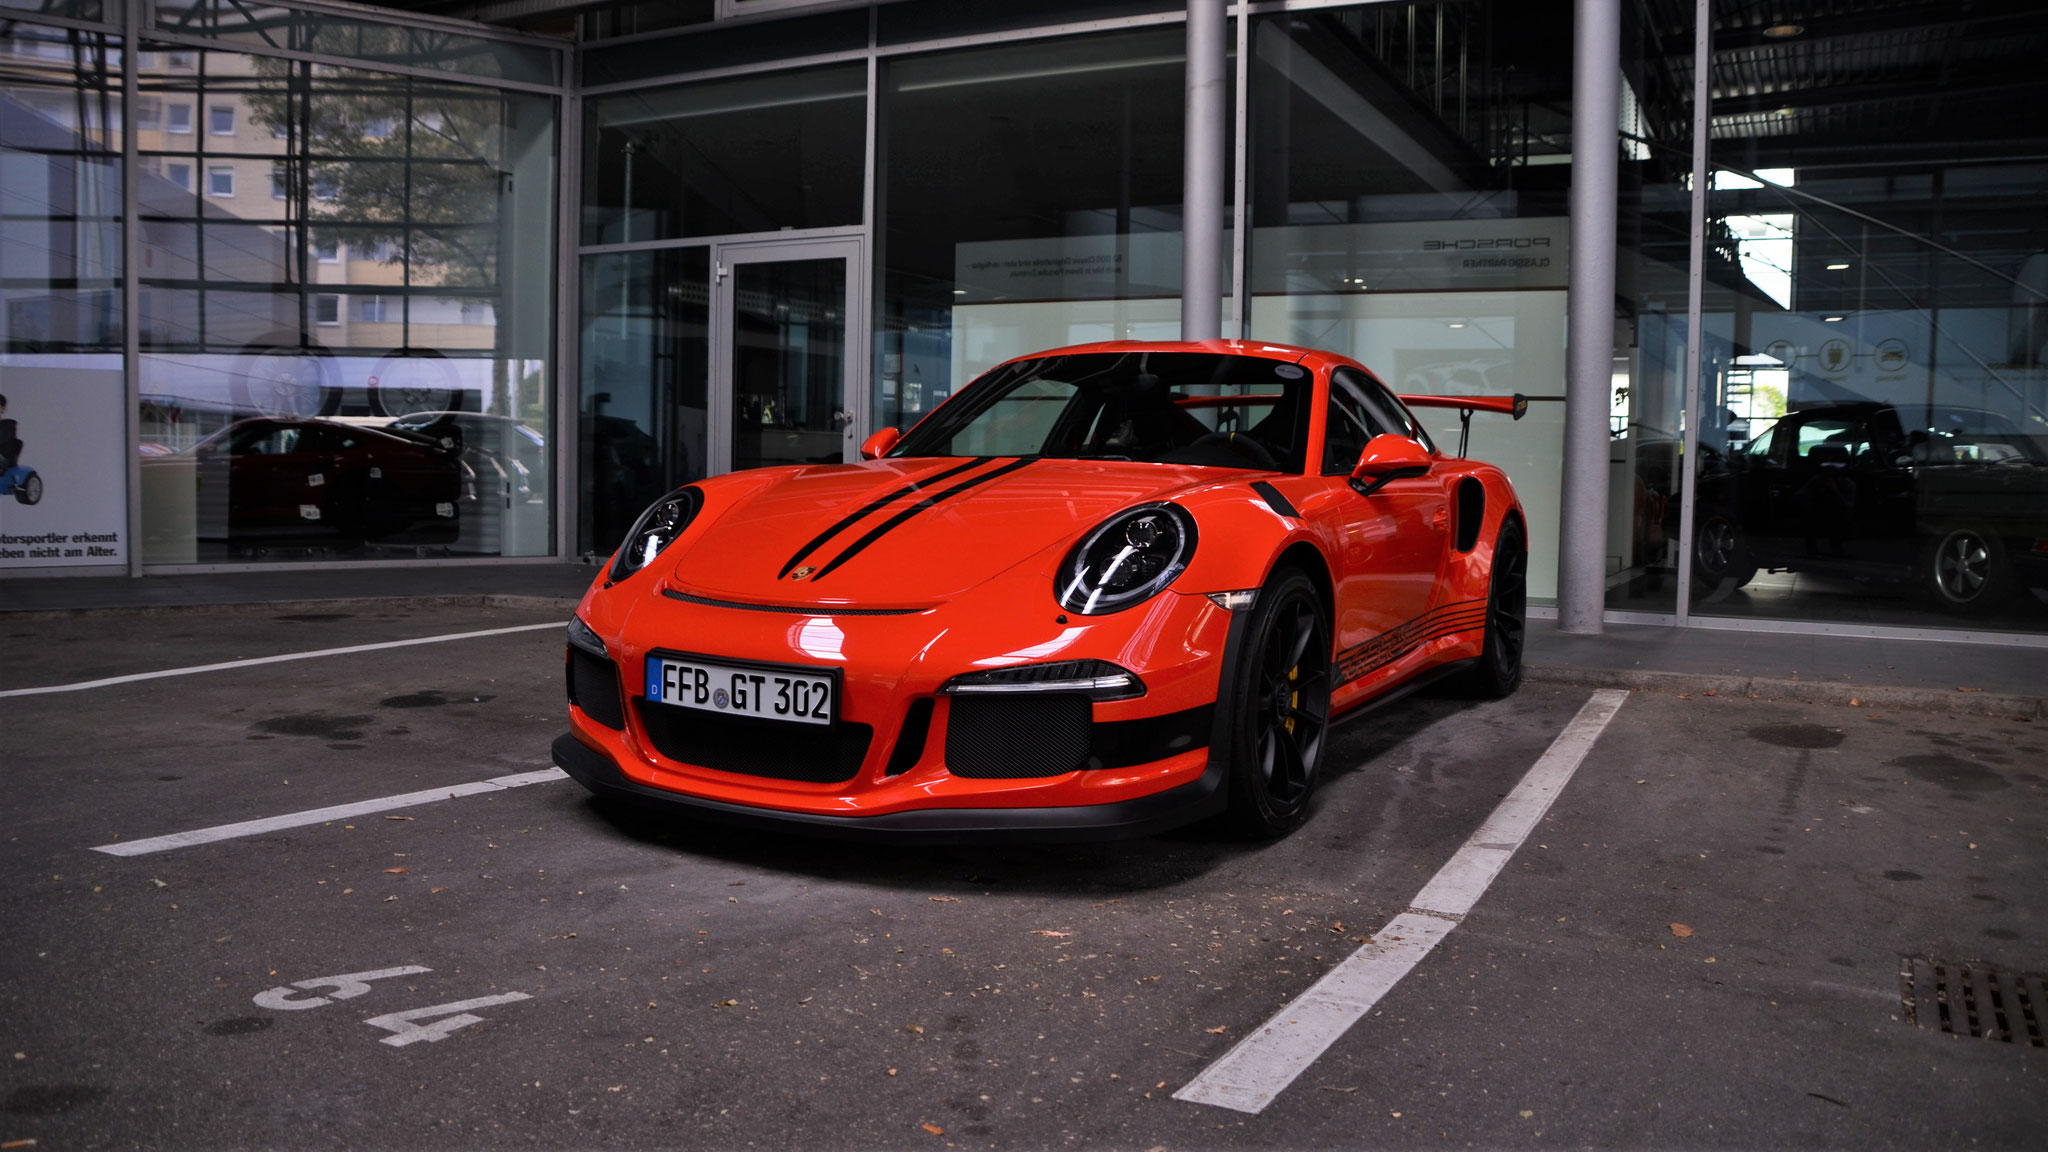 Porsche 911 GT3 RS - FFB-GT-302